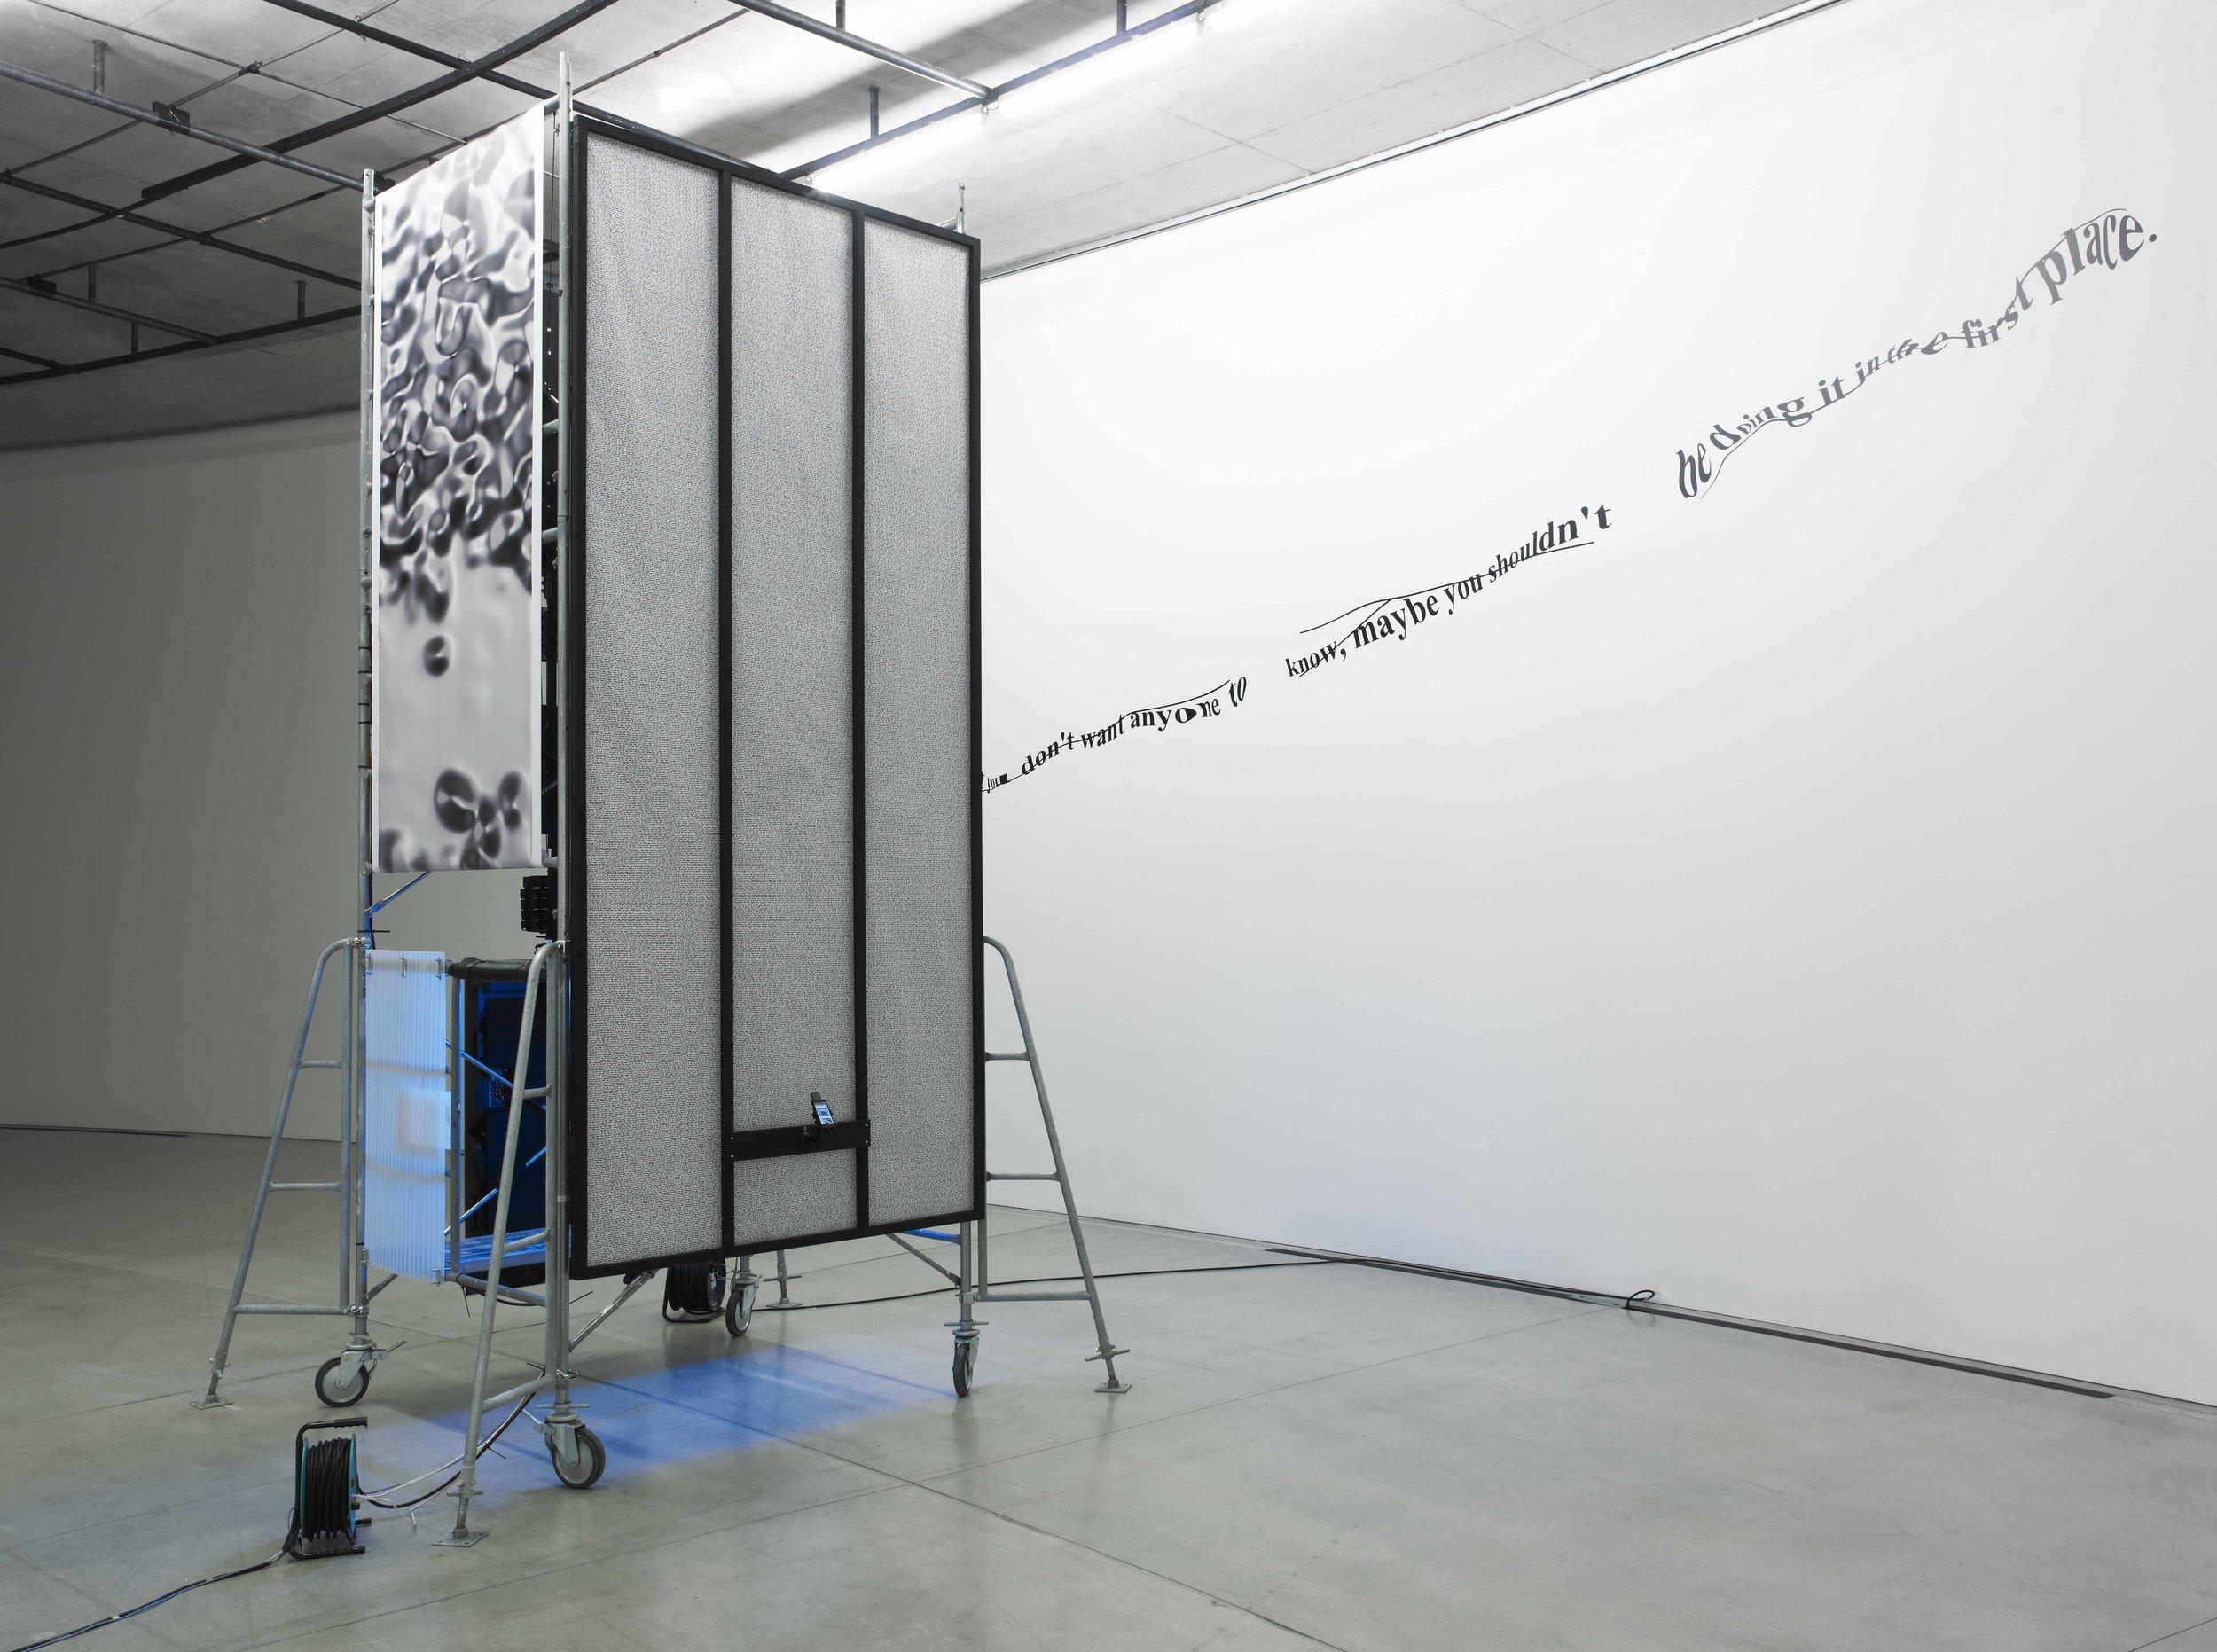 Installation View. Photo Credit: Tadasu Yamamoto Courtesy of: ACAC